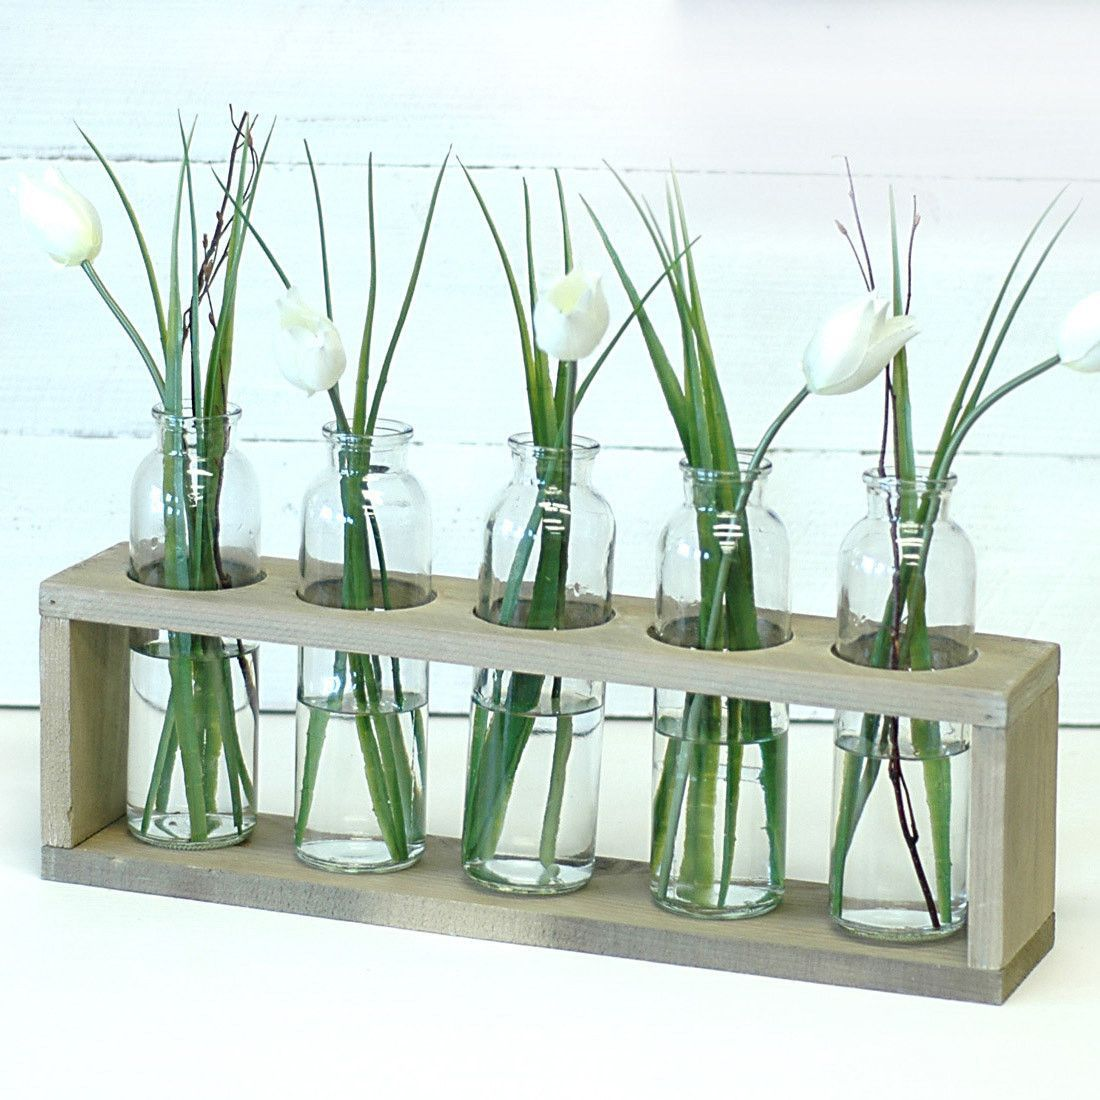 Make Wall Mounted Vases From Empty Wine Bottles Diy Wine Bottle